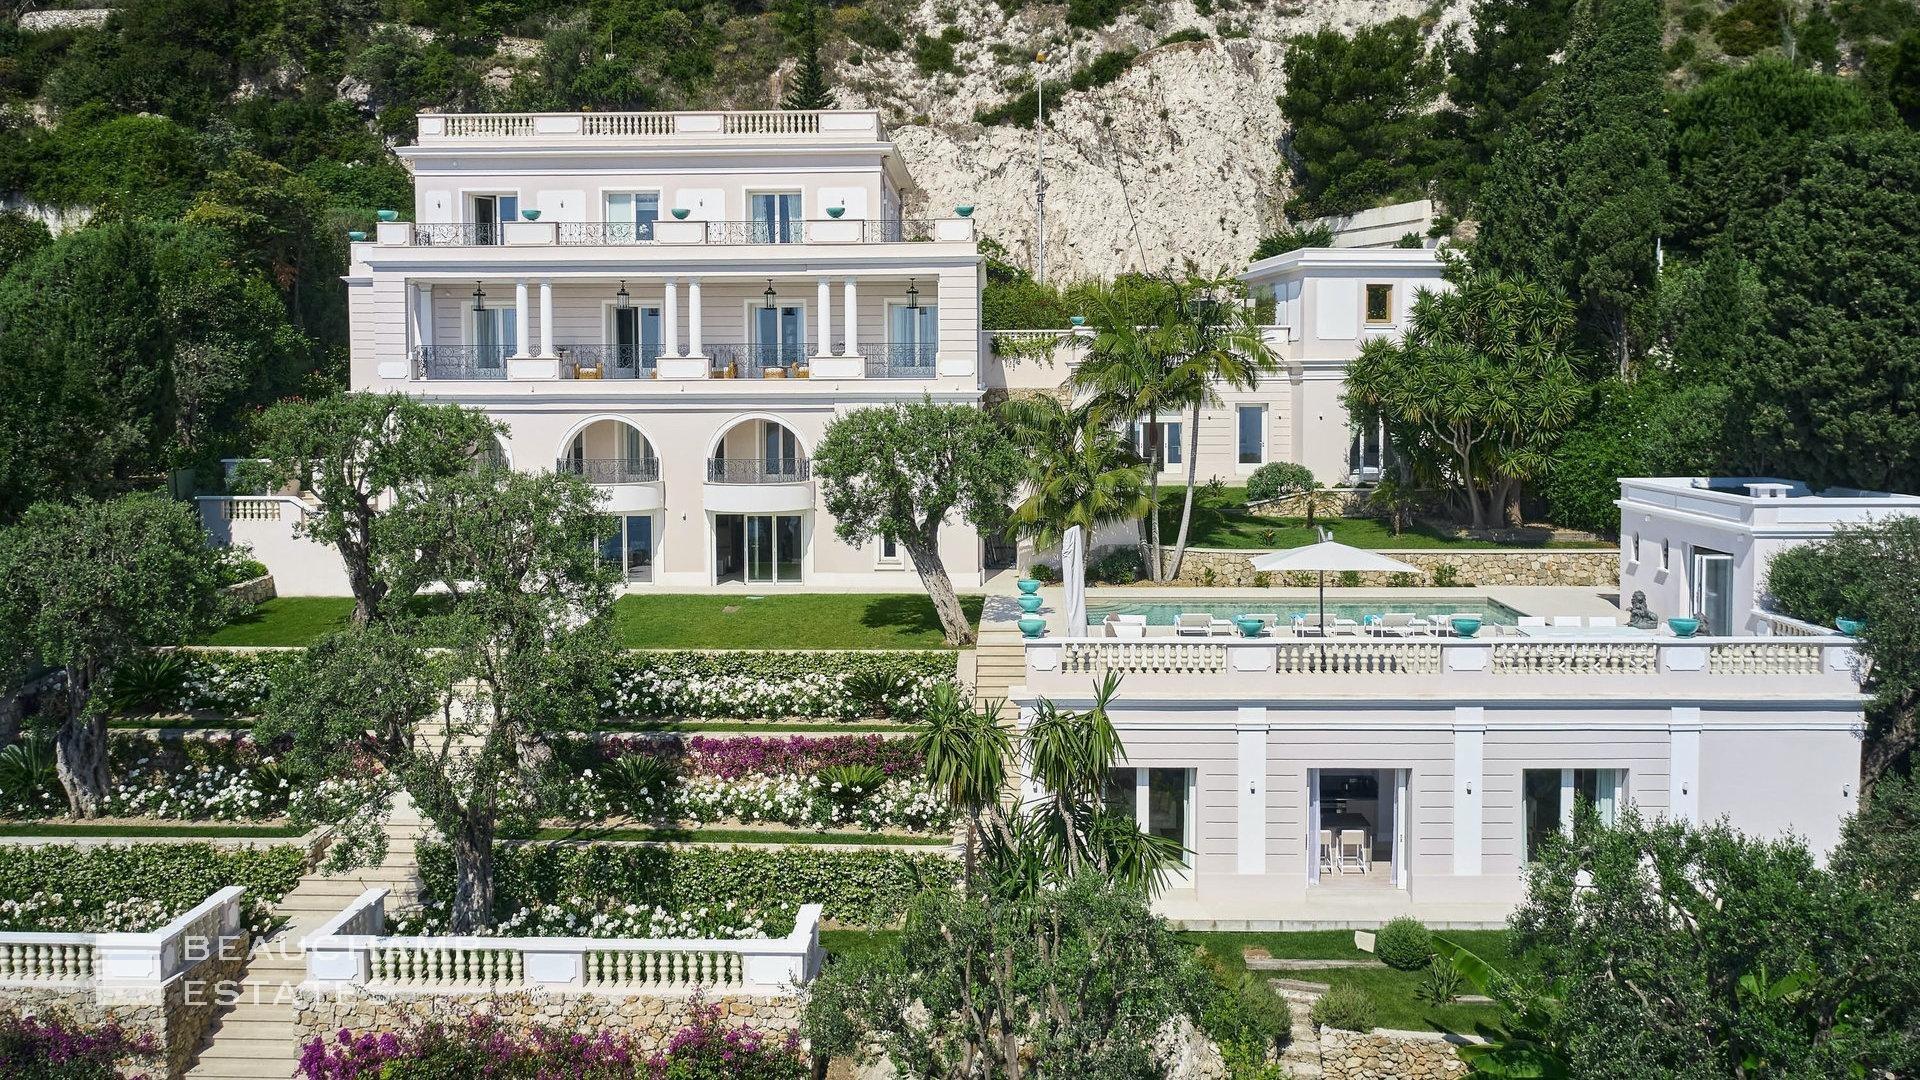 Villa in Saint-Jean-Cap-Ferrat, Provence-Alpes-Côte d'Azur, France 1 - 11016154